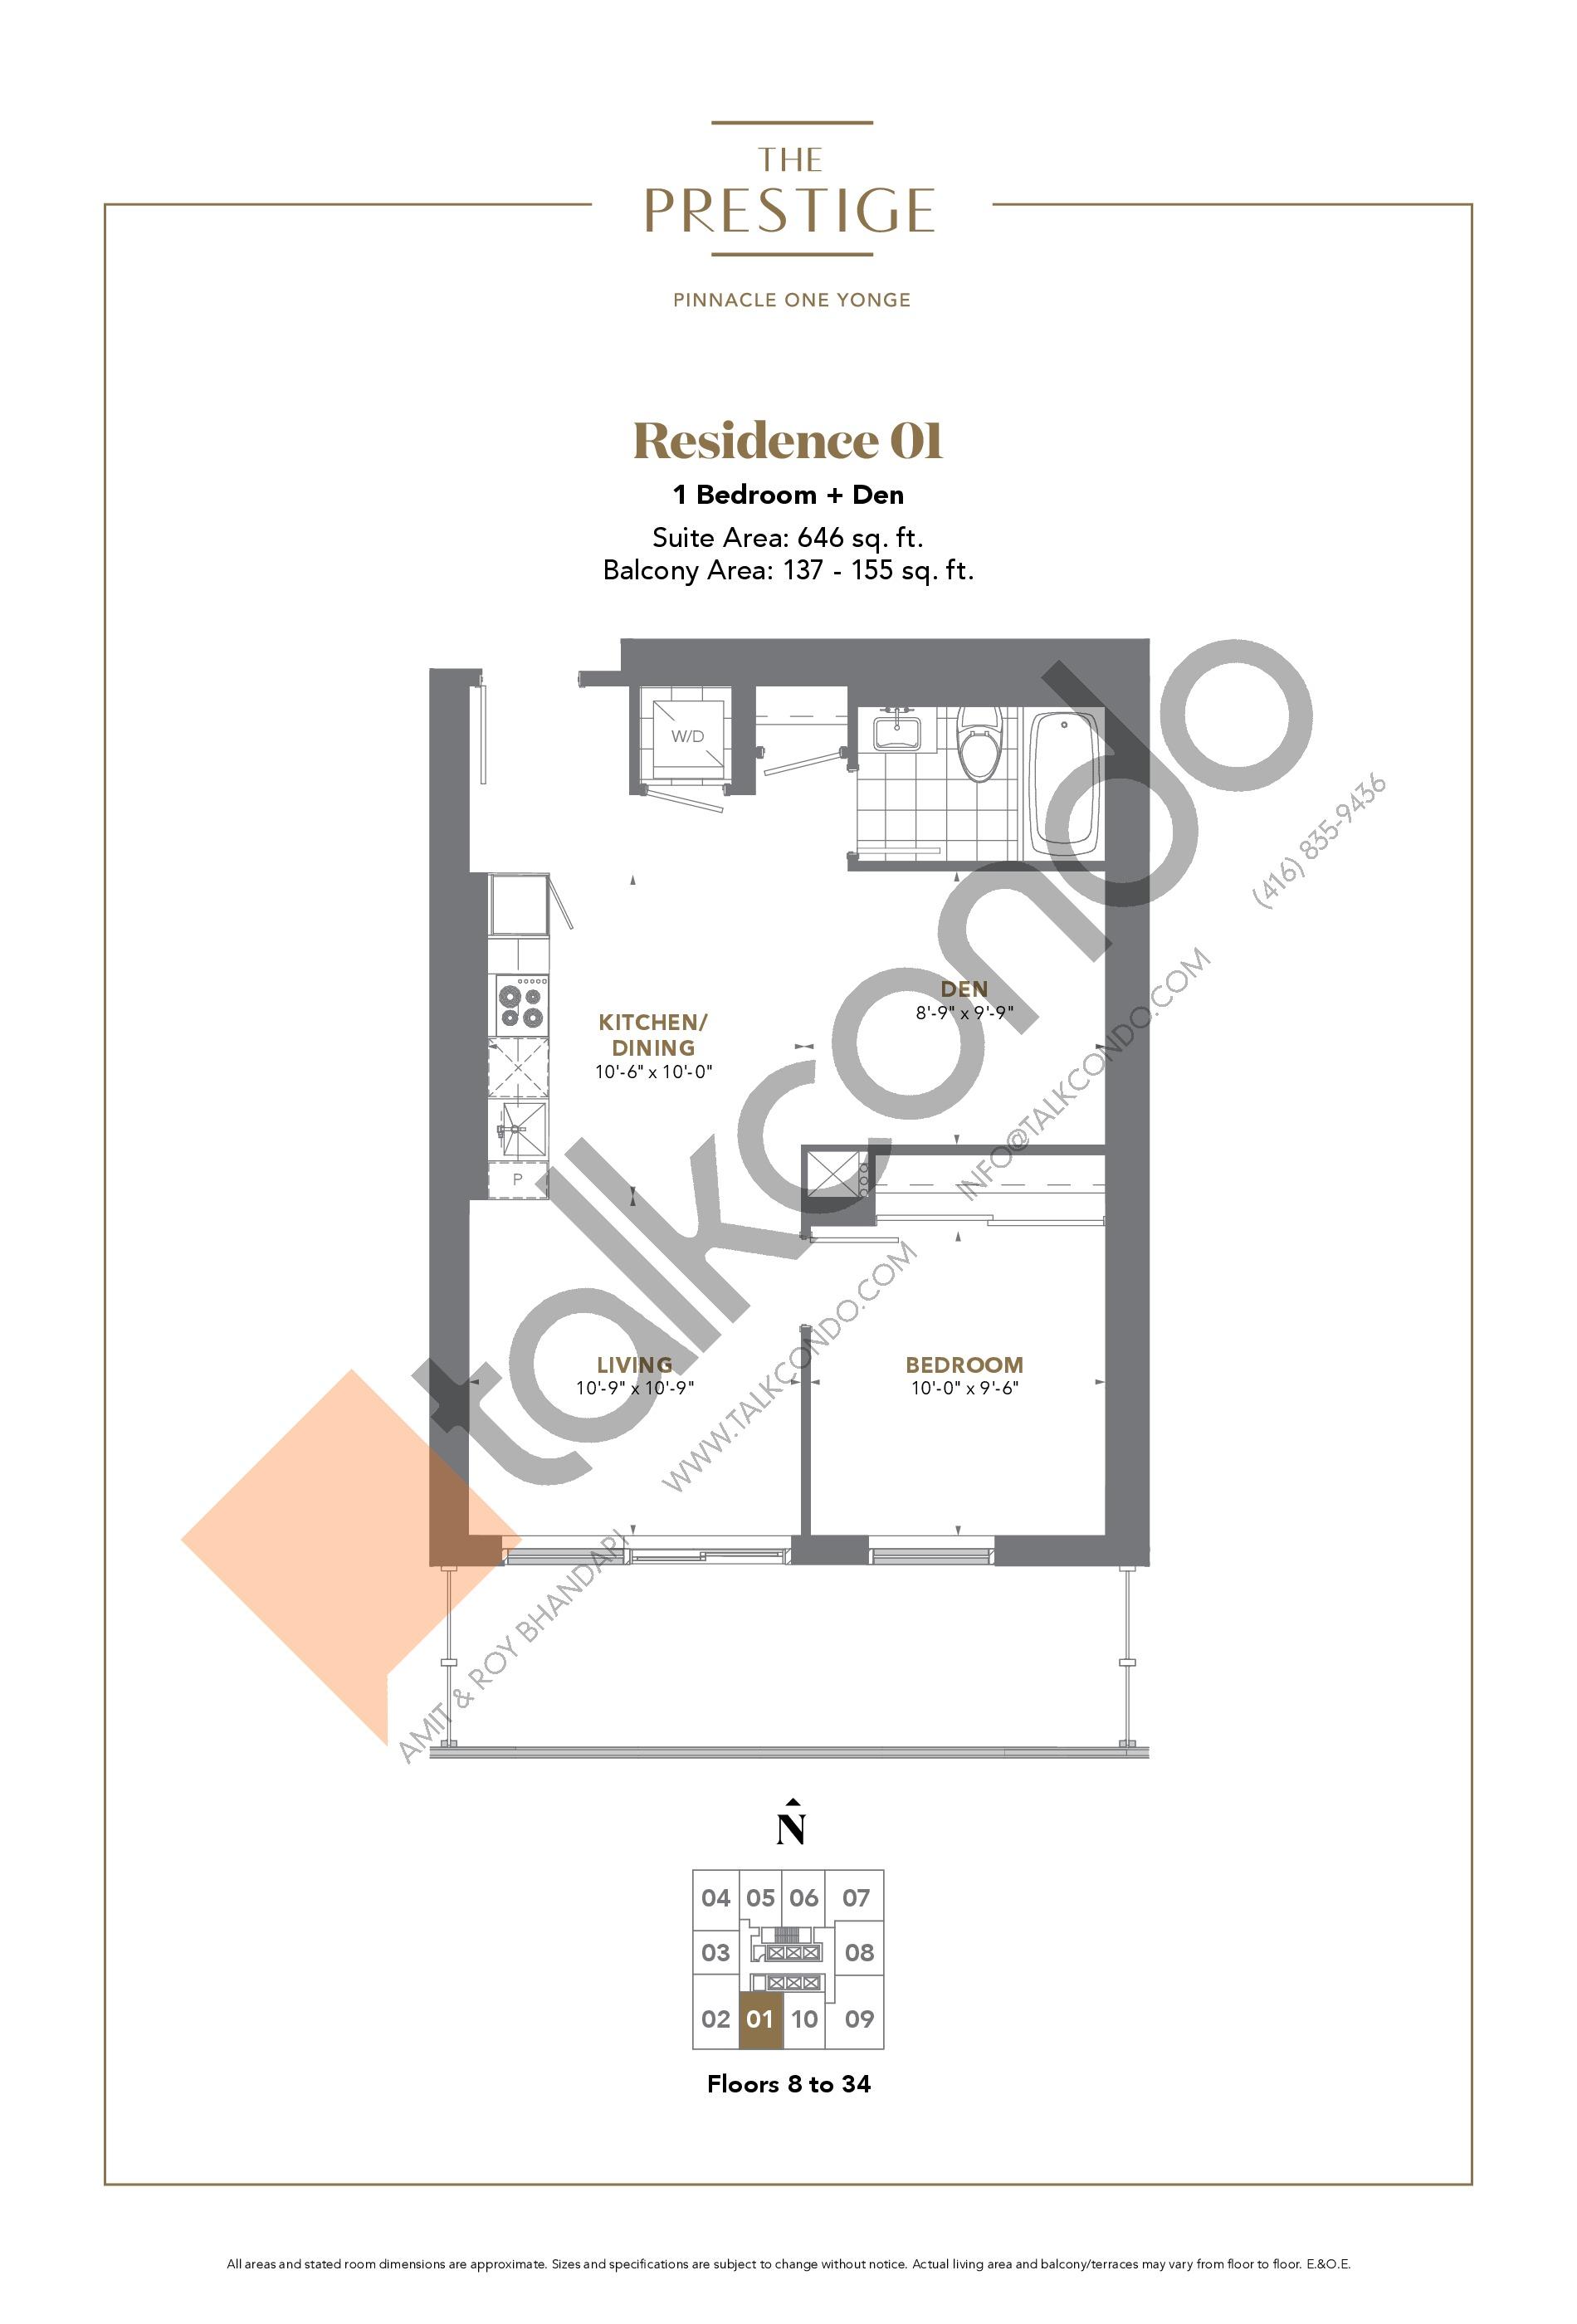 Residence 01 Floor Plan at The Prestige Condos at Pinnacle One Yonge - 646 sq.ft